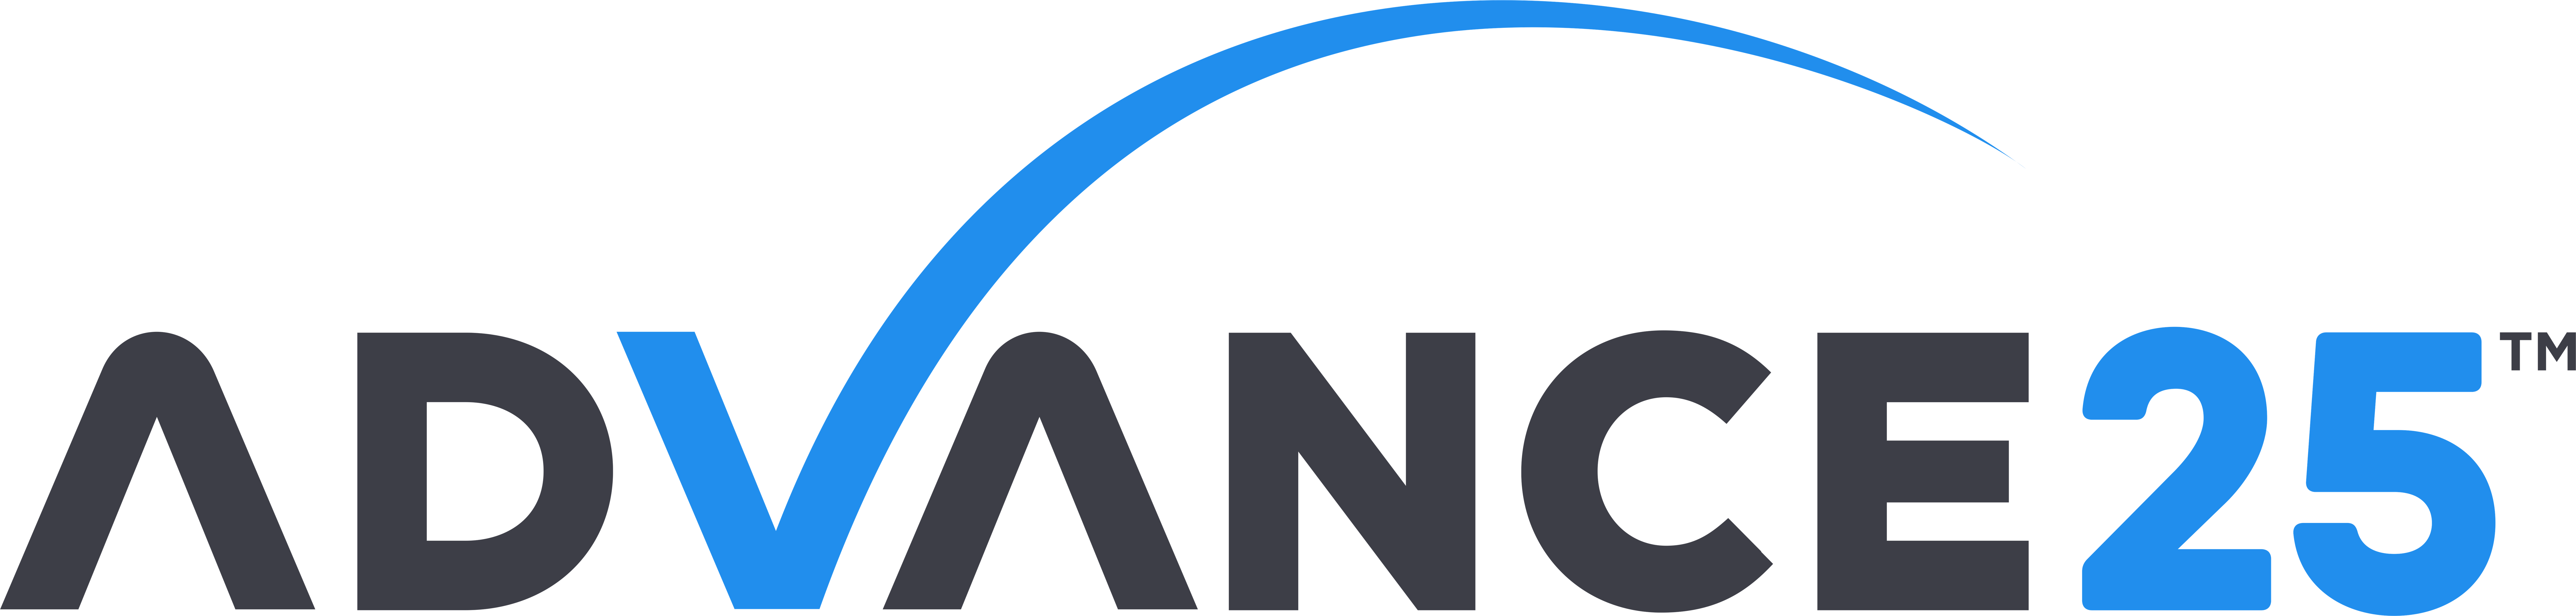 Advance Basic Logo